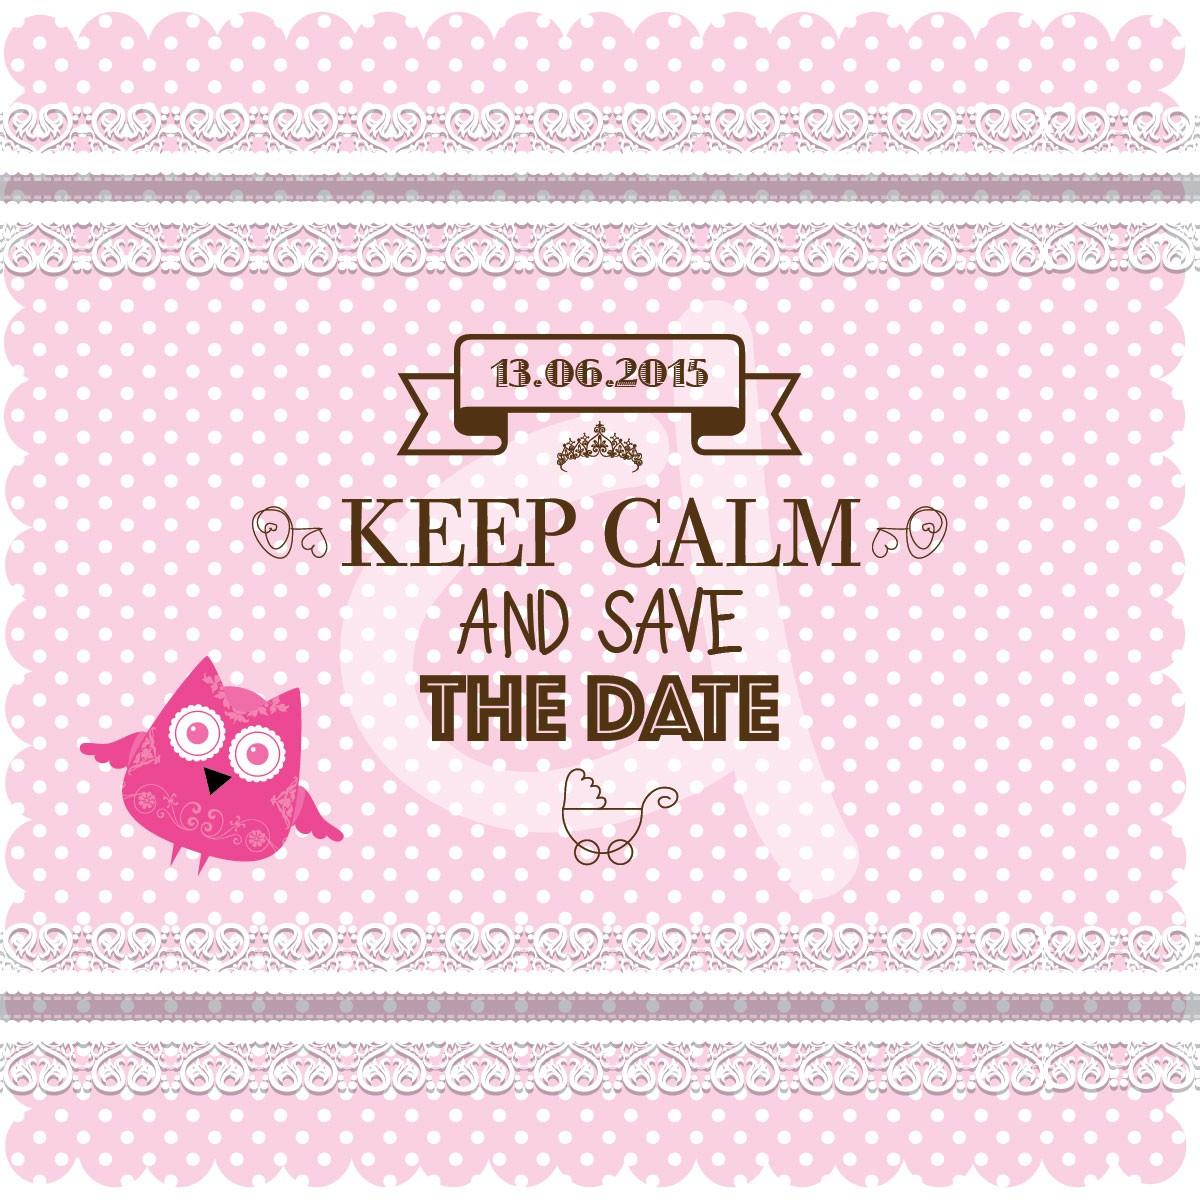 Keep calm κουκουβάγια